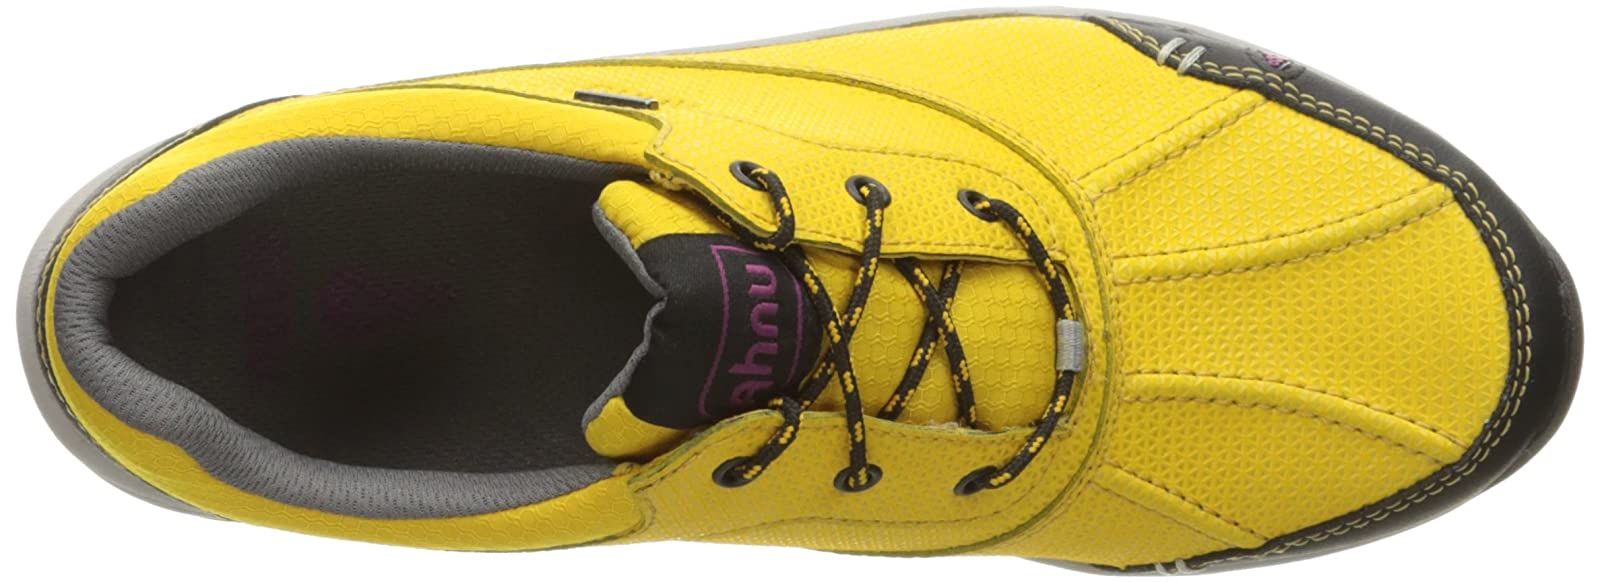 Ahnu Women's Calaveras Waterproof Hiking Shoe 5 M US - 8